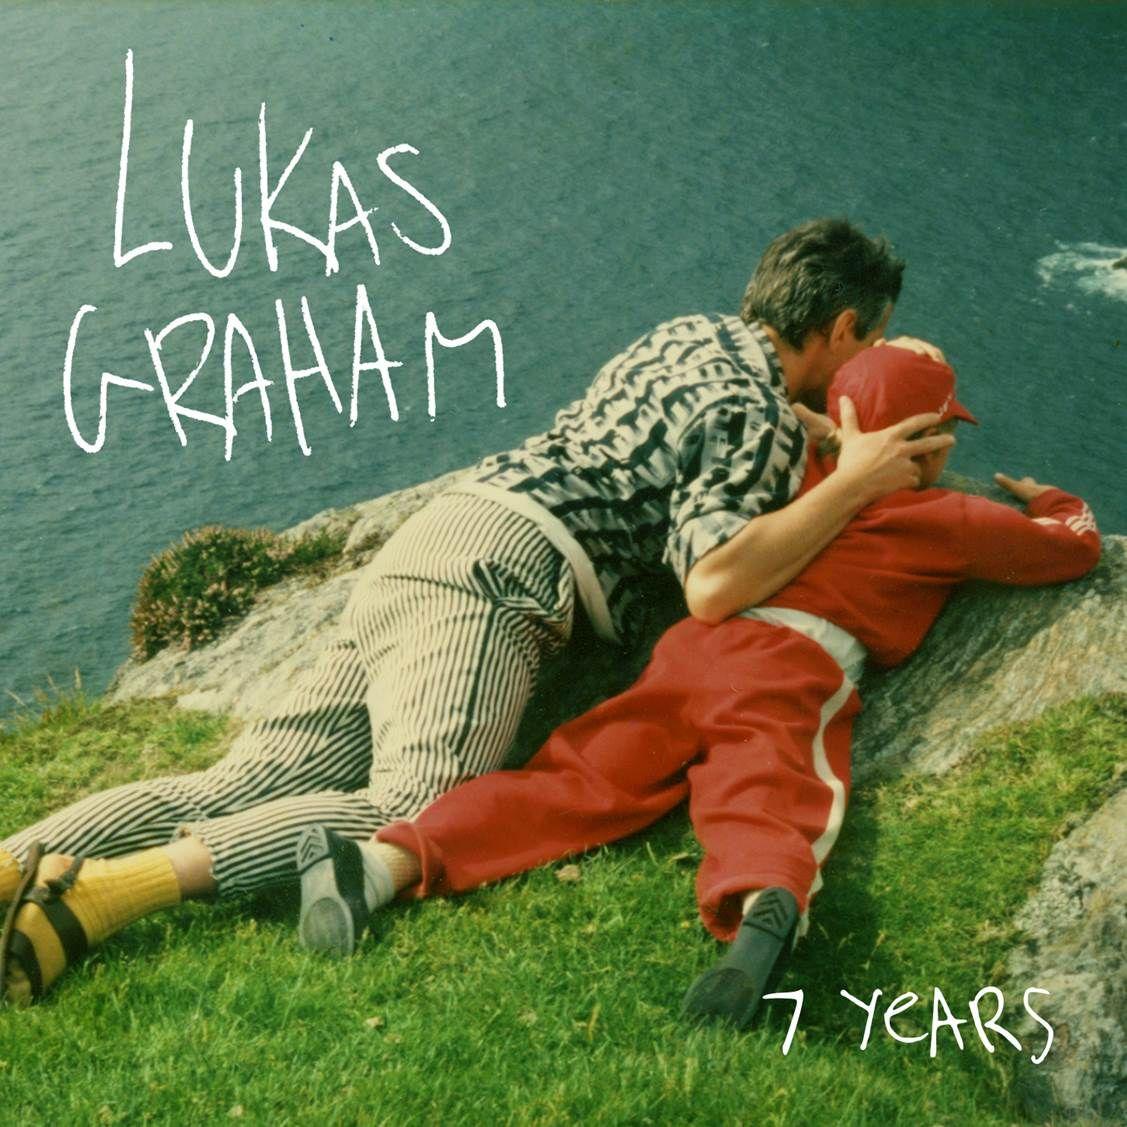 Lukas Graham – 7 Years (single cover art)